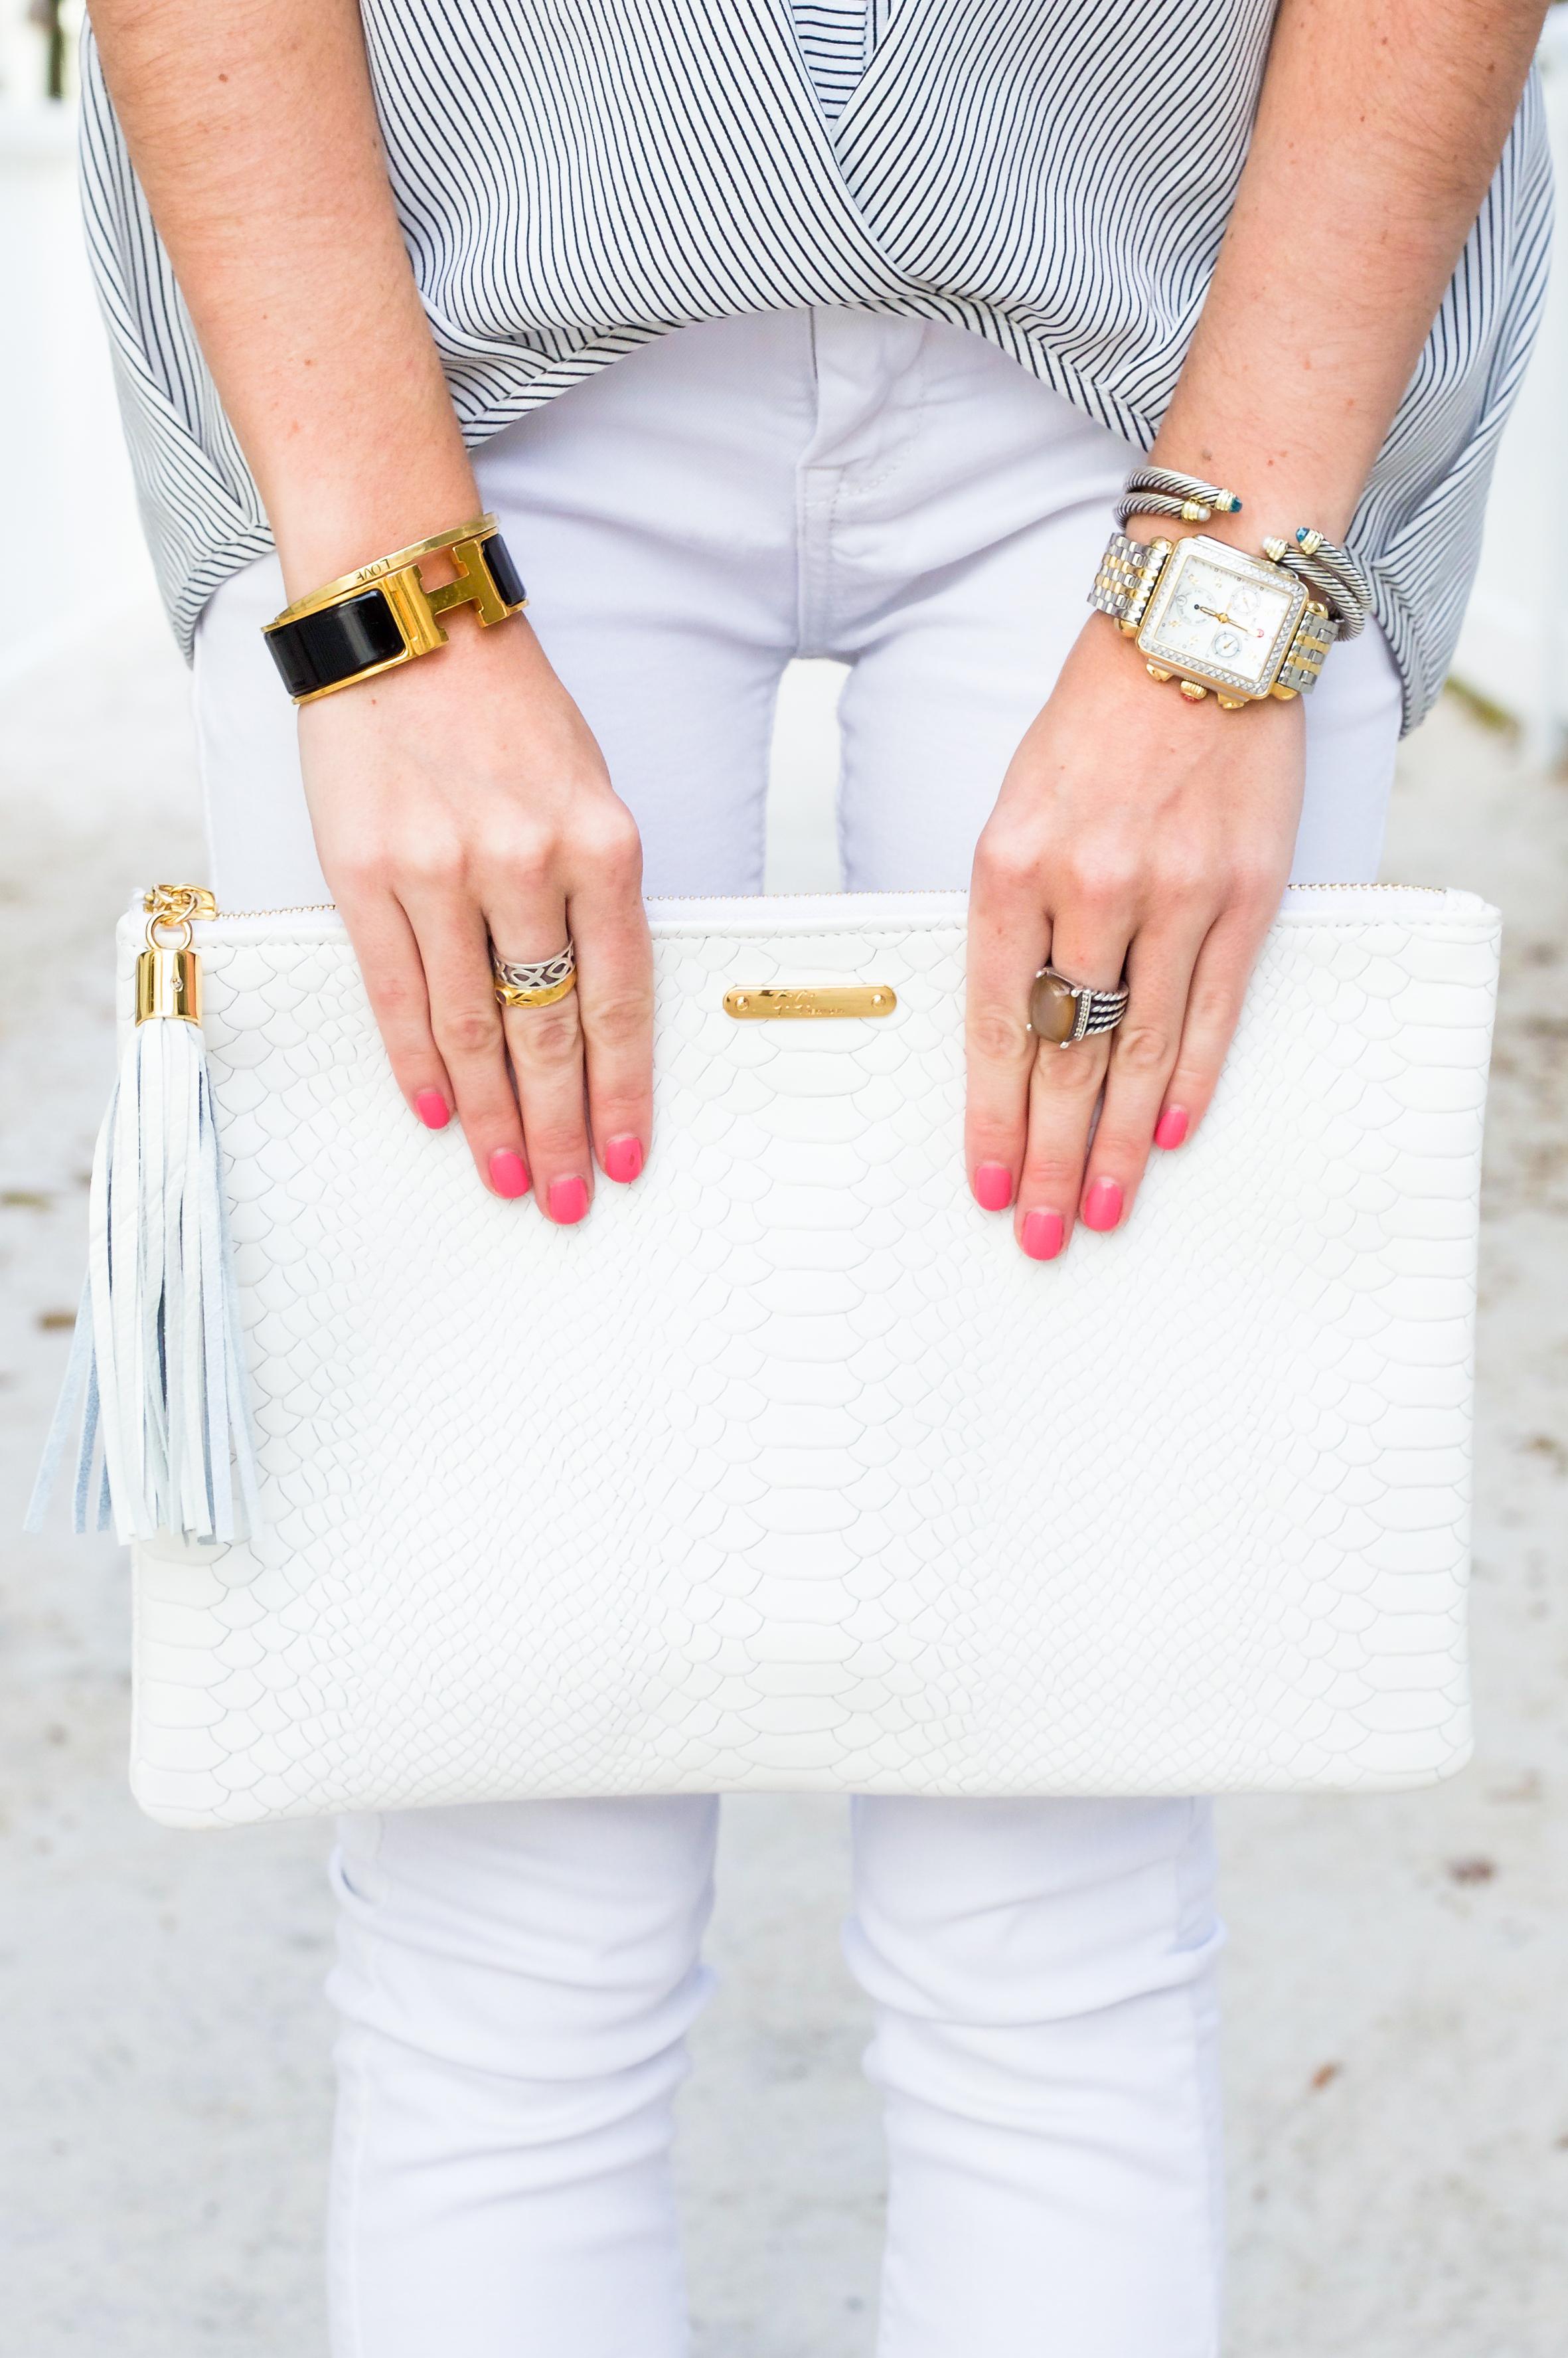 lcb style fashion blogger monkees seaside beach florida (11 of 15).jpg